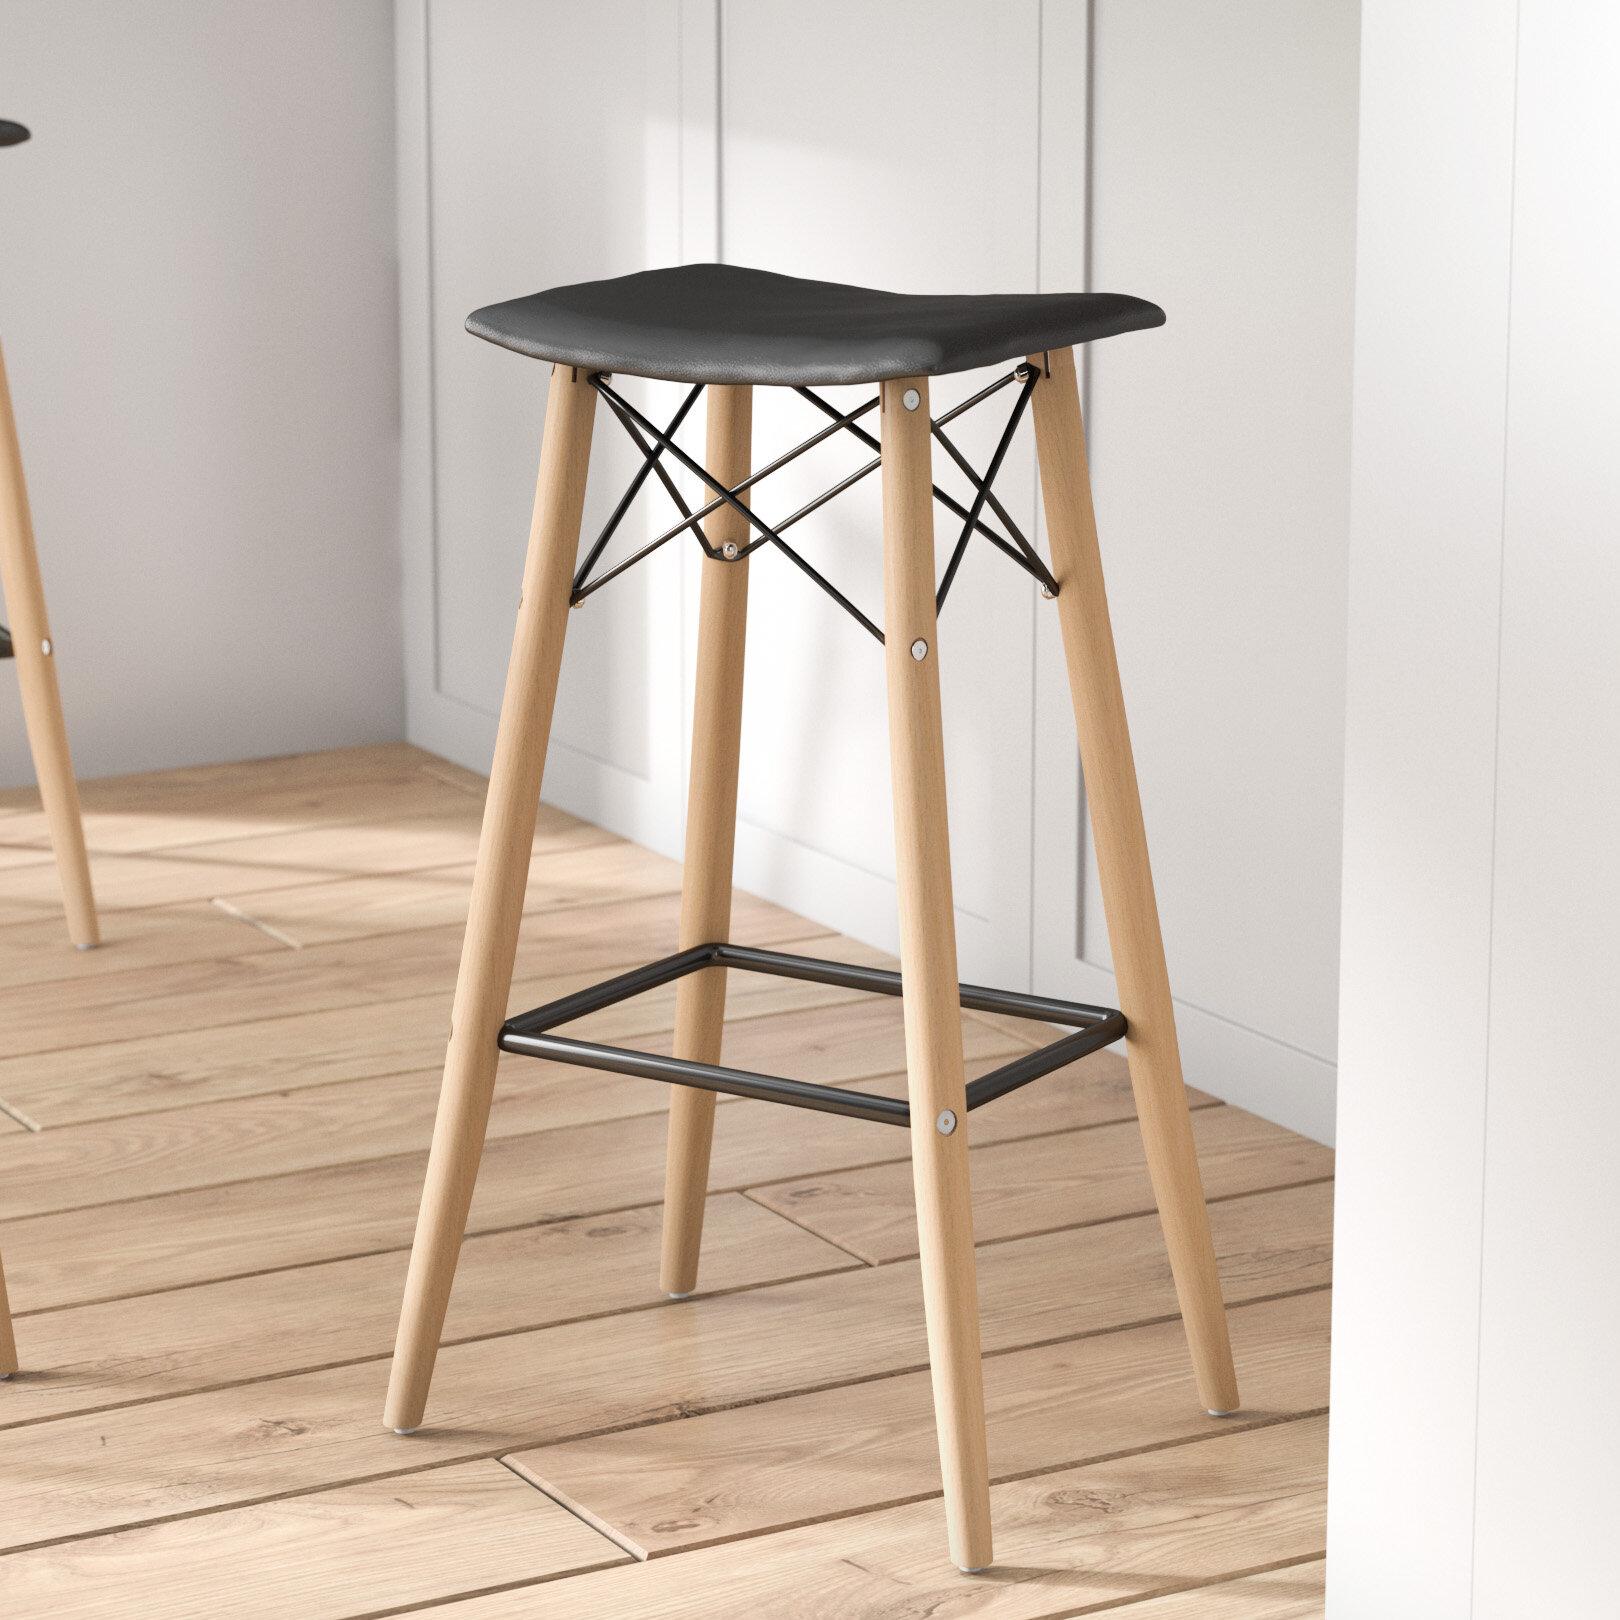 Brayden studio catt 26 bar stool reviews wayfair